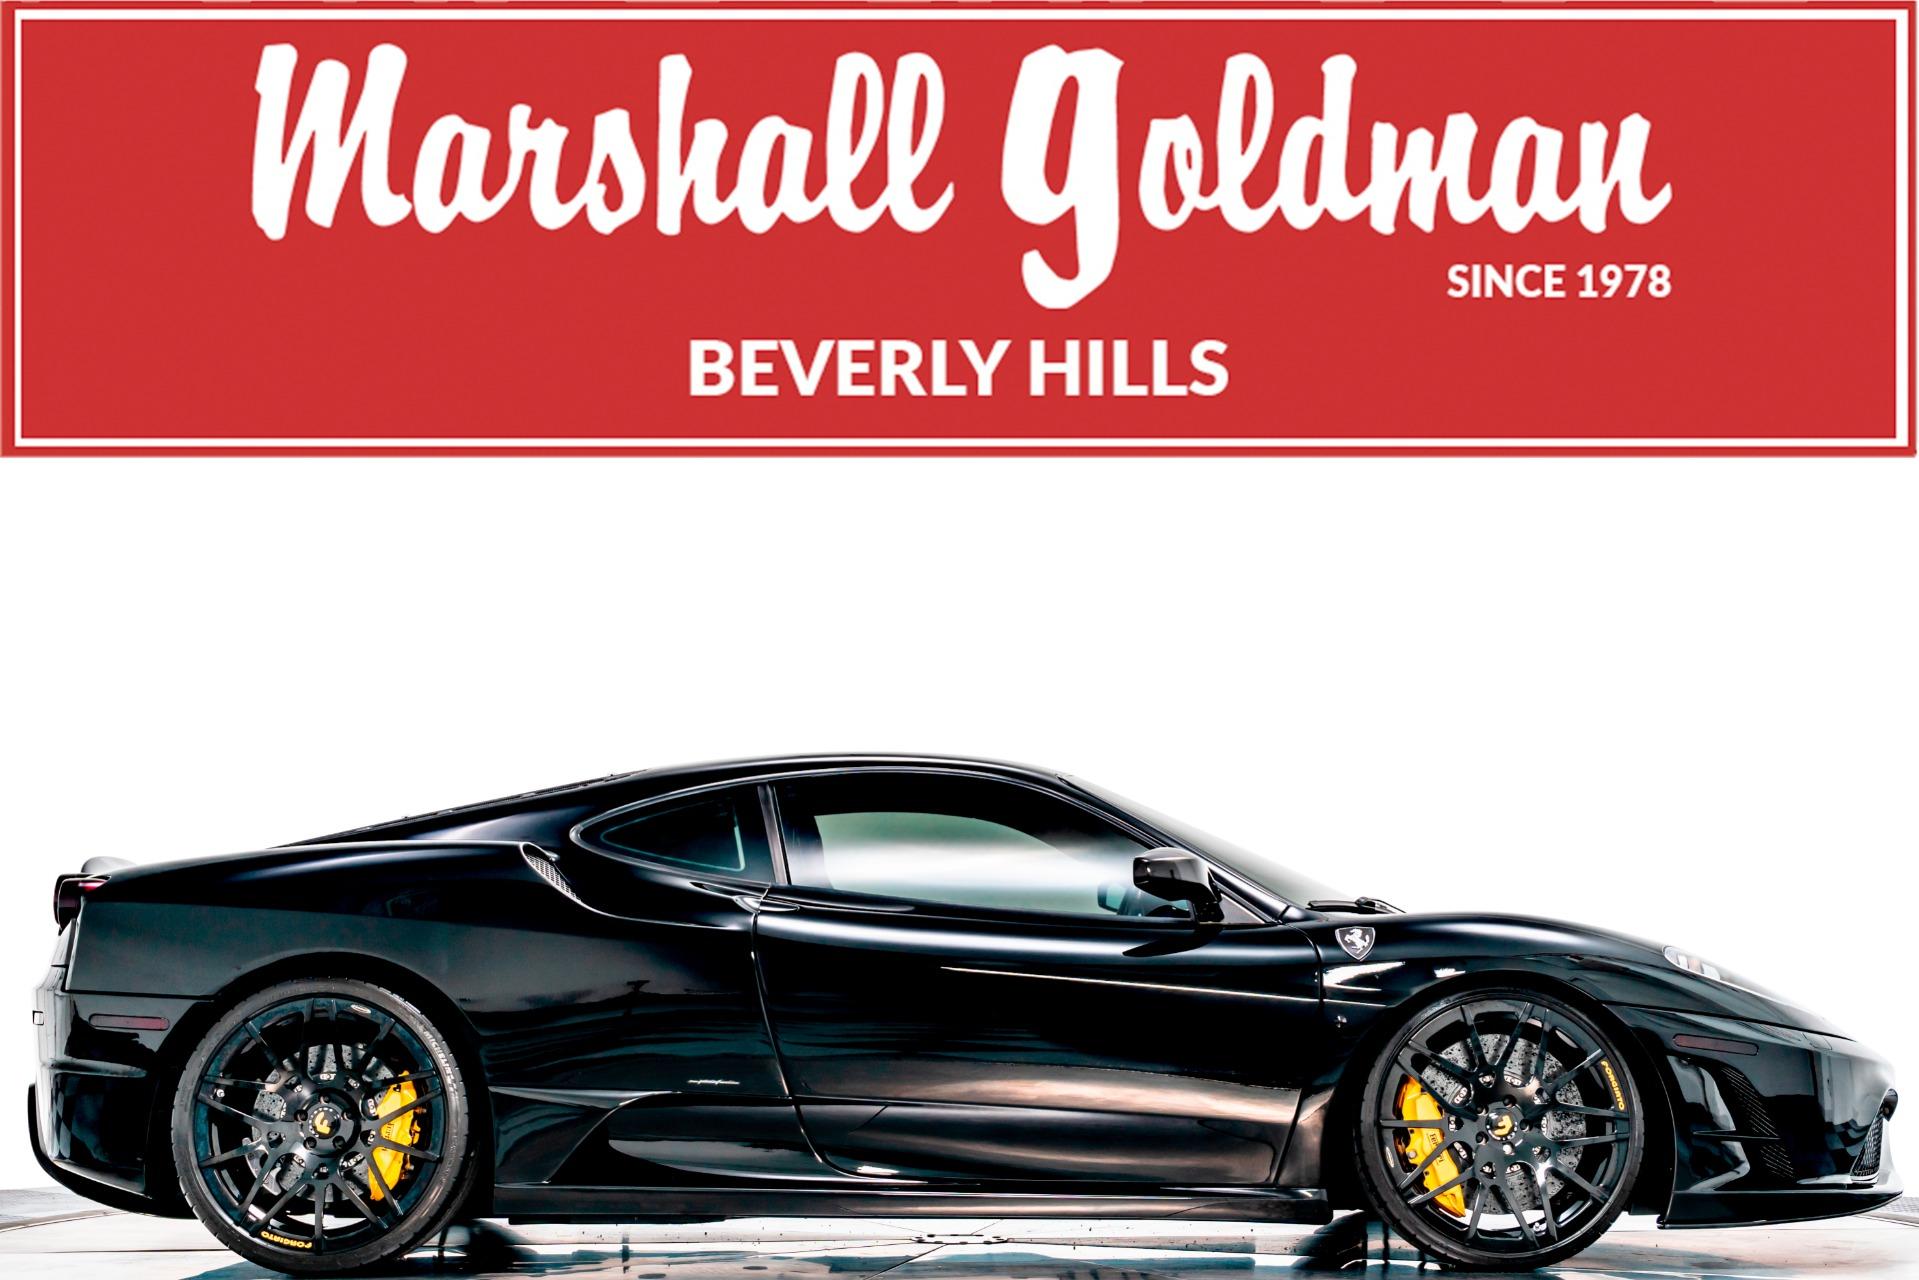 Used 2008 Ferrari F430 Scuderia For Sale Sold Marshall Goldman Cleveland Stock B21000